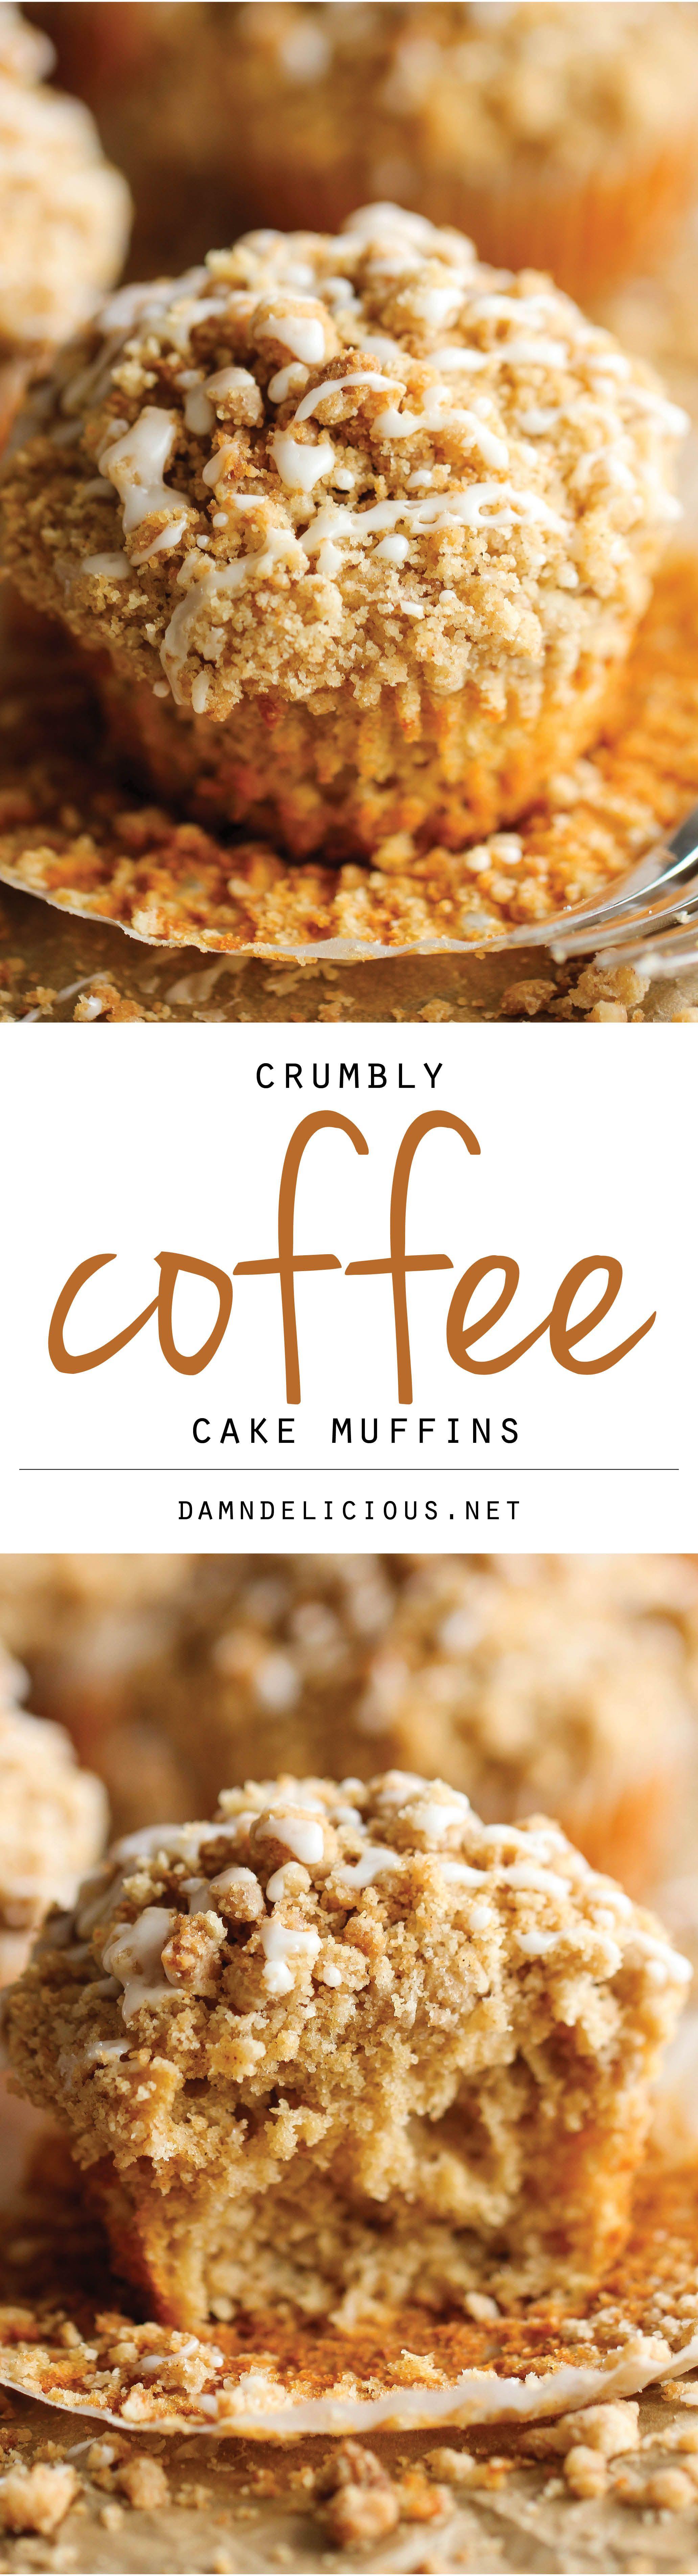 Coffee Cake Muffins | Receta | Recetas para cocinar ...